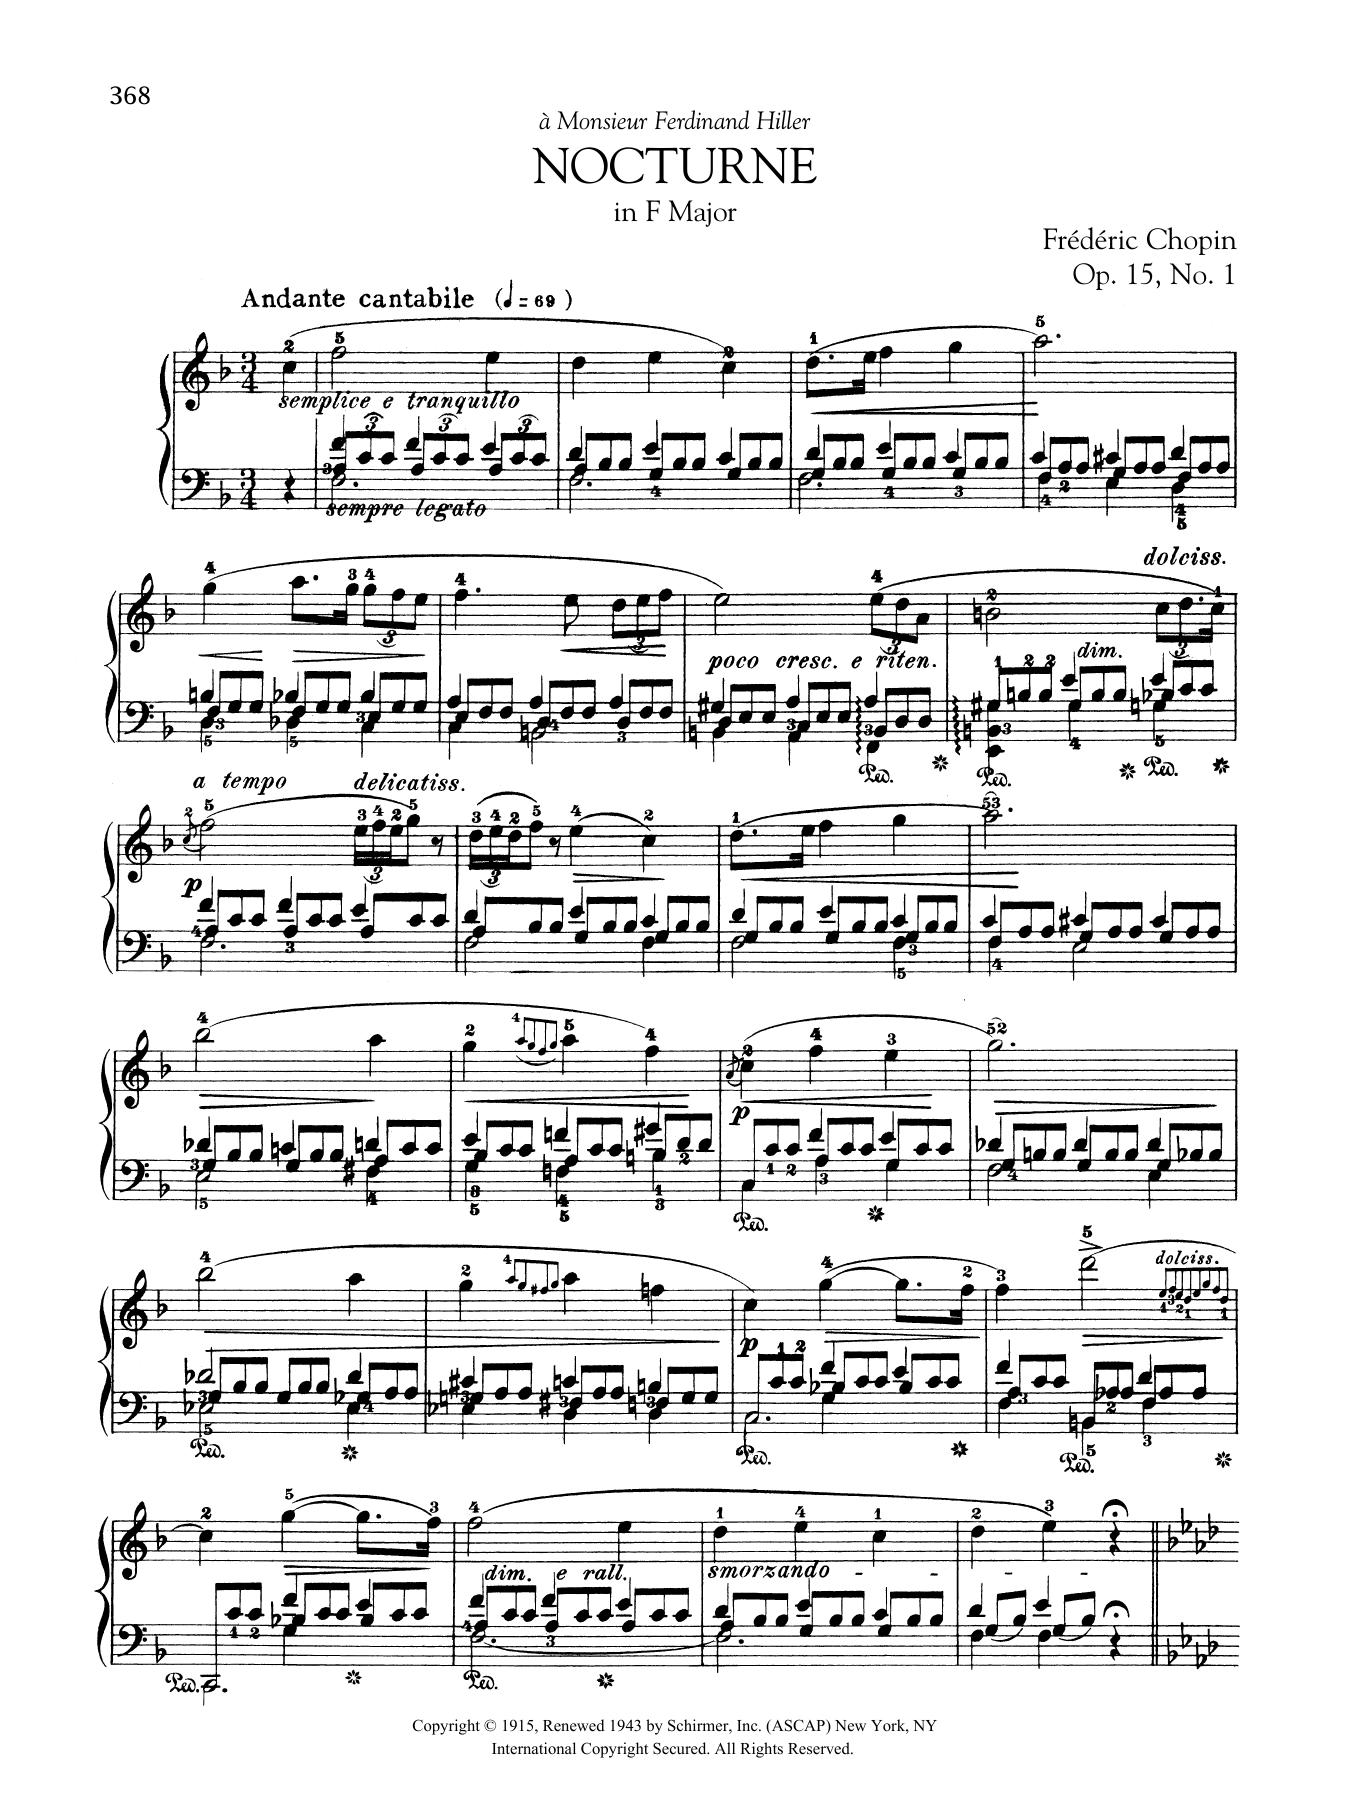 Nocturne in F Major, Op. 15, No. 1 Sheet Music